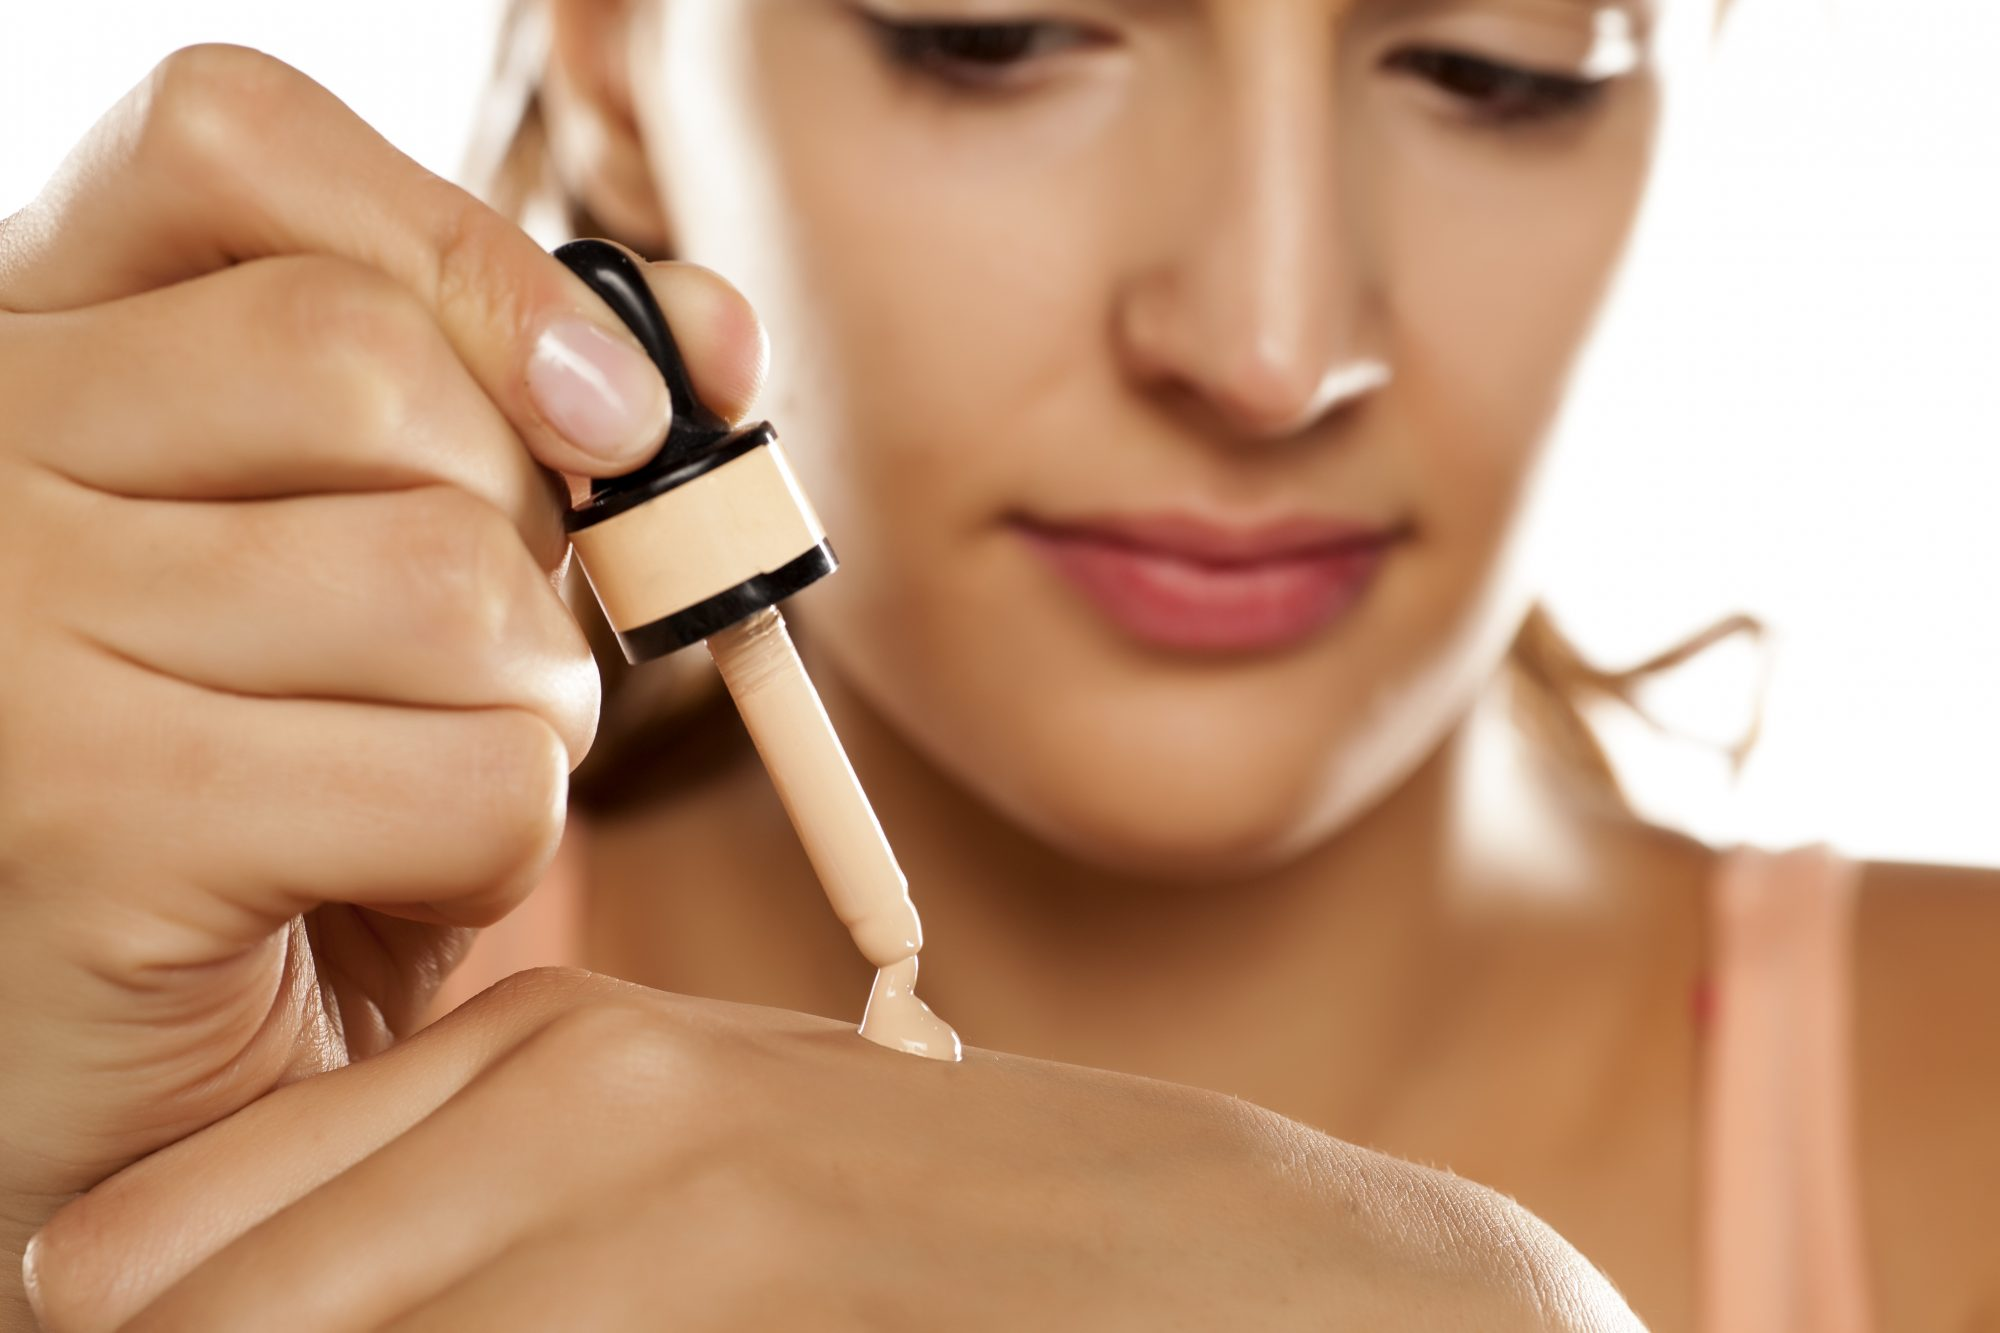 base de maquilaje, maquillaje